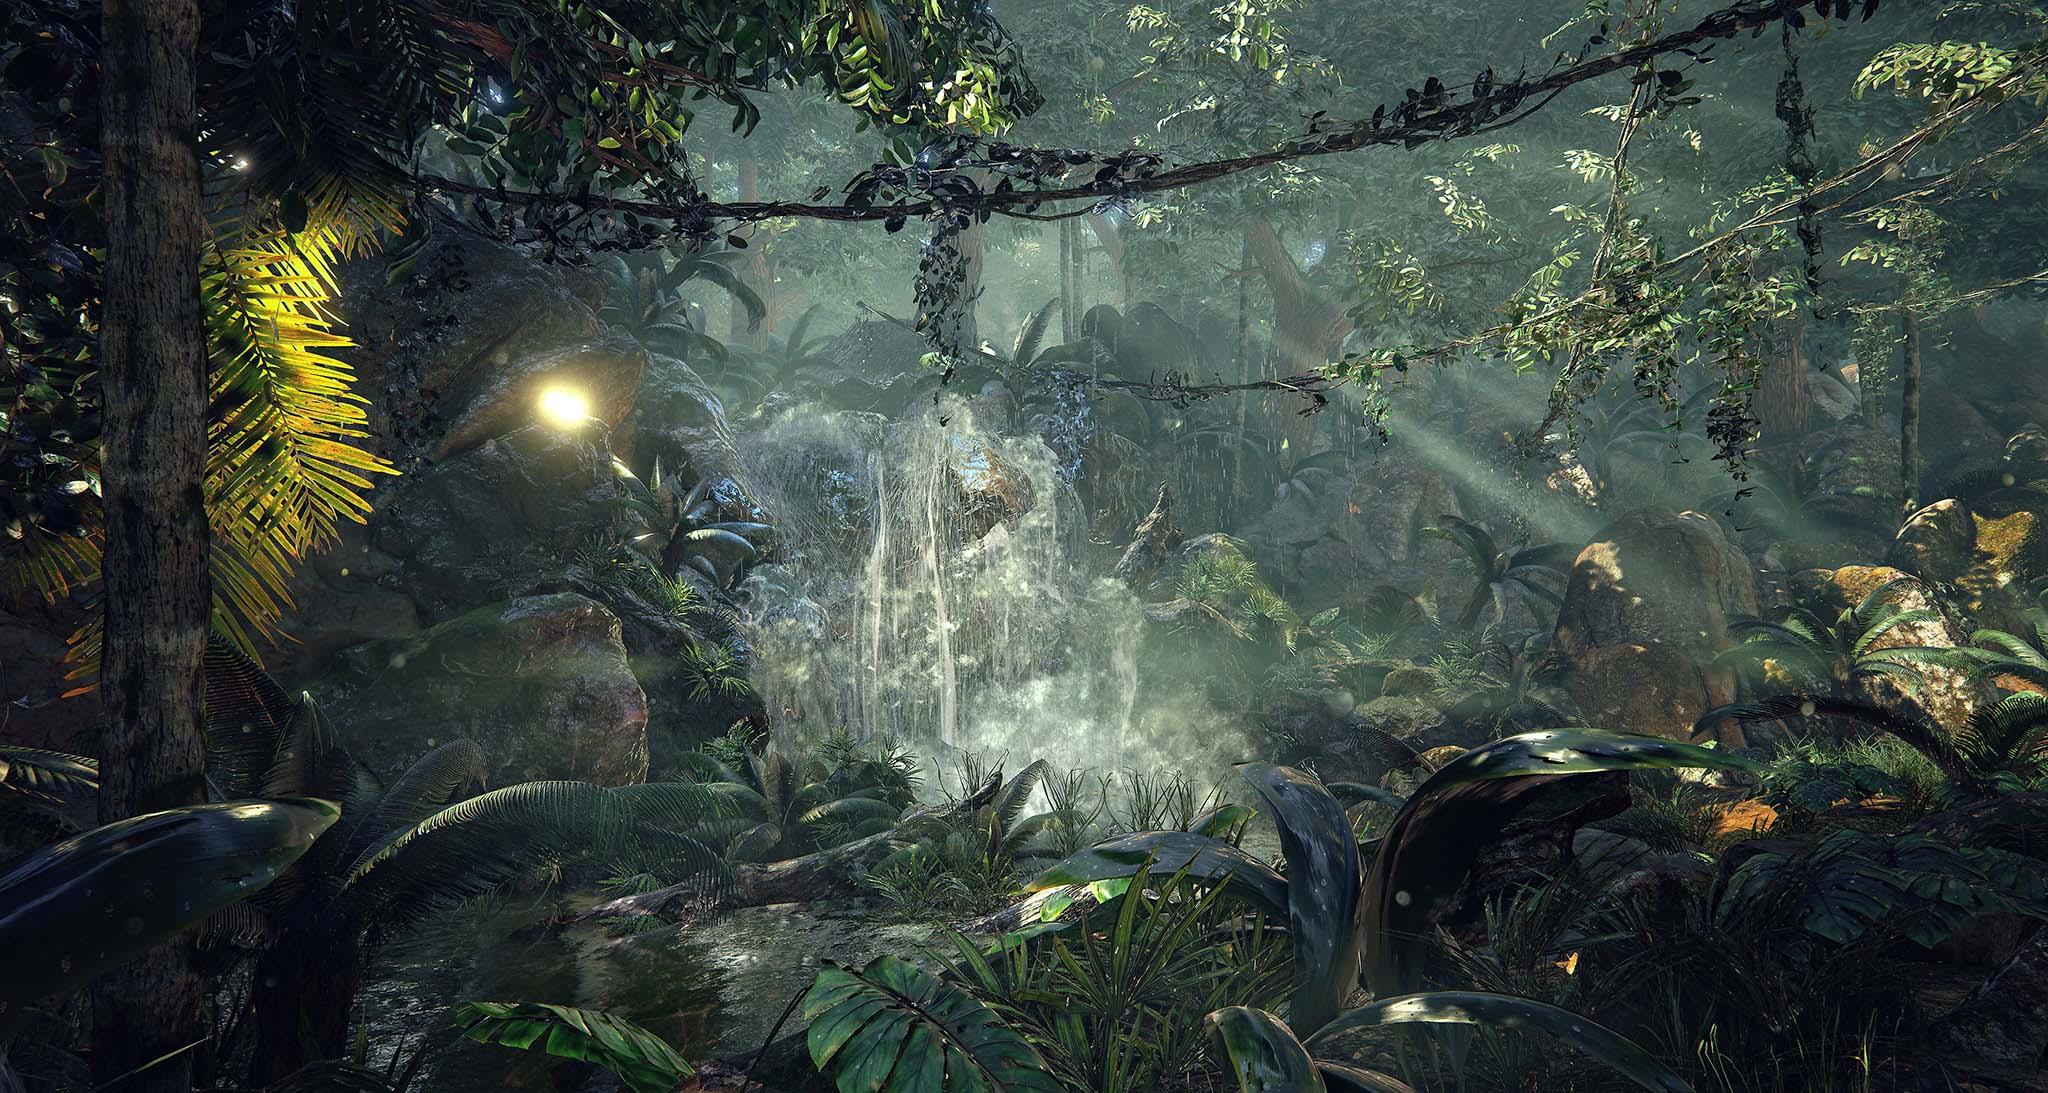 Unreal-Engine-4-Quixel's-Jungle-Environment-3